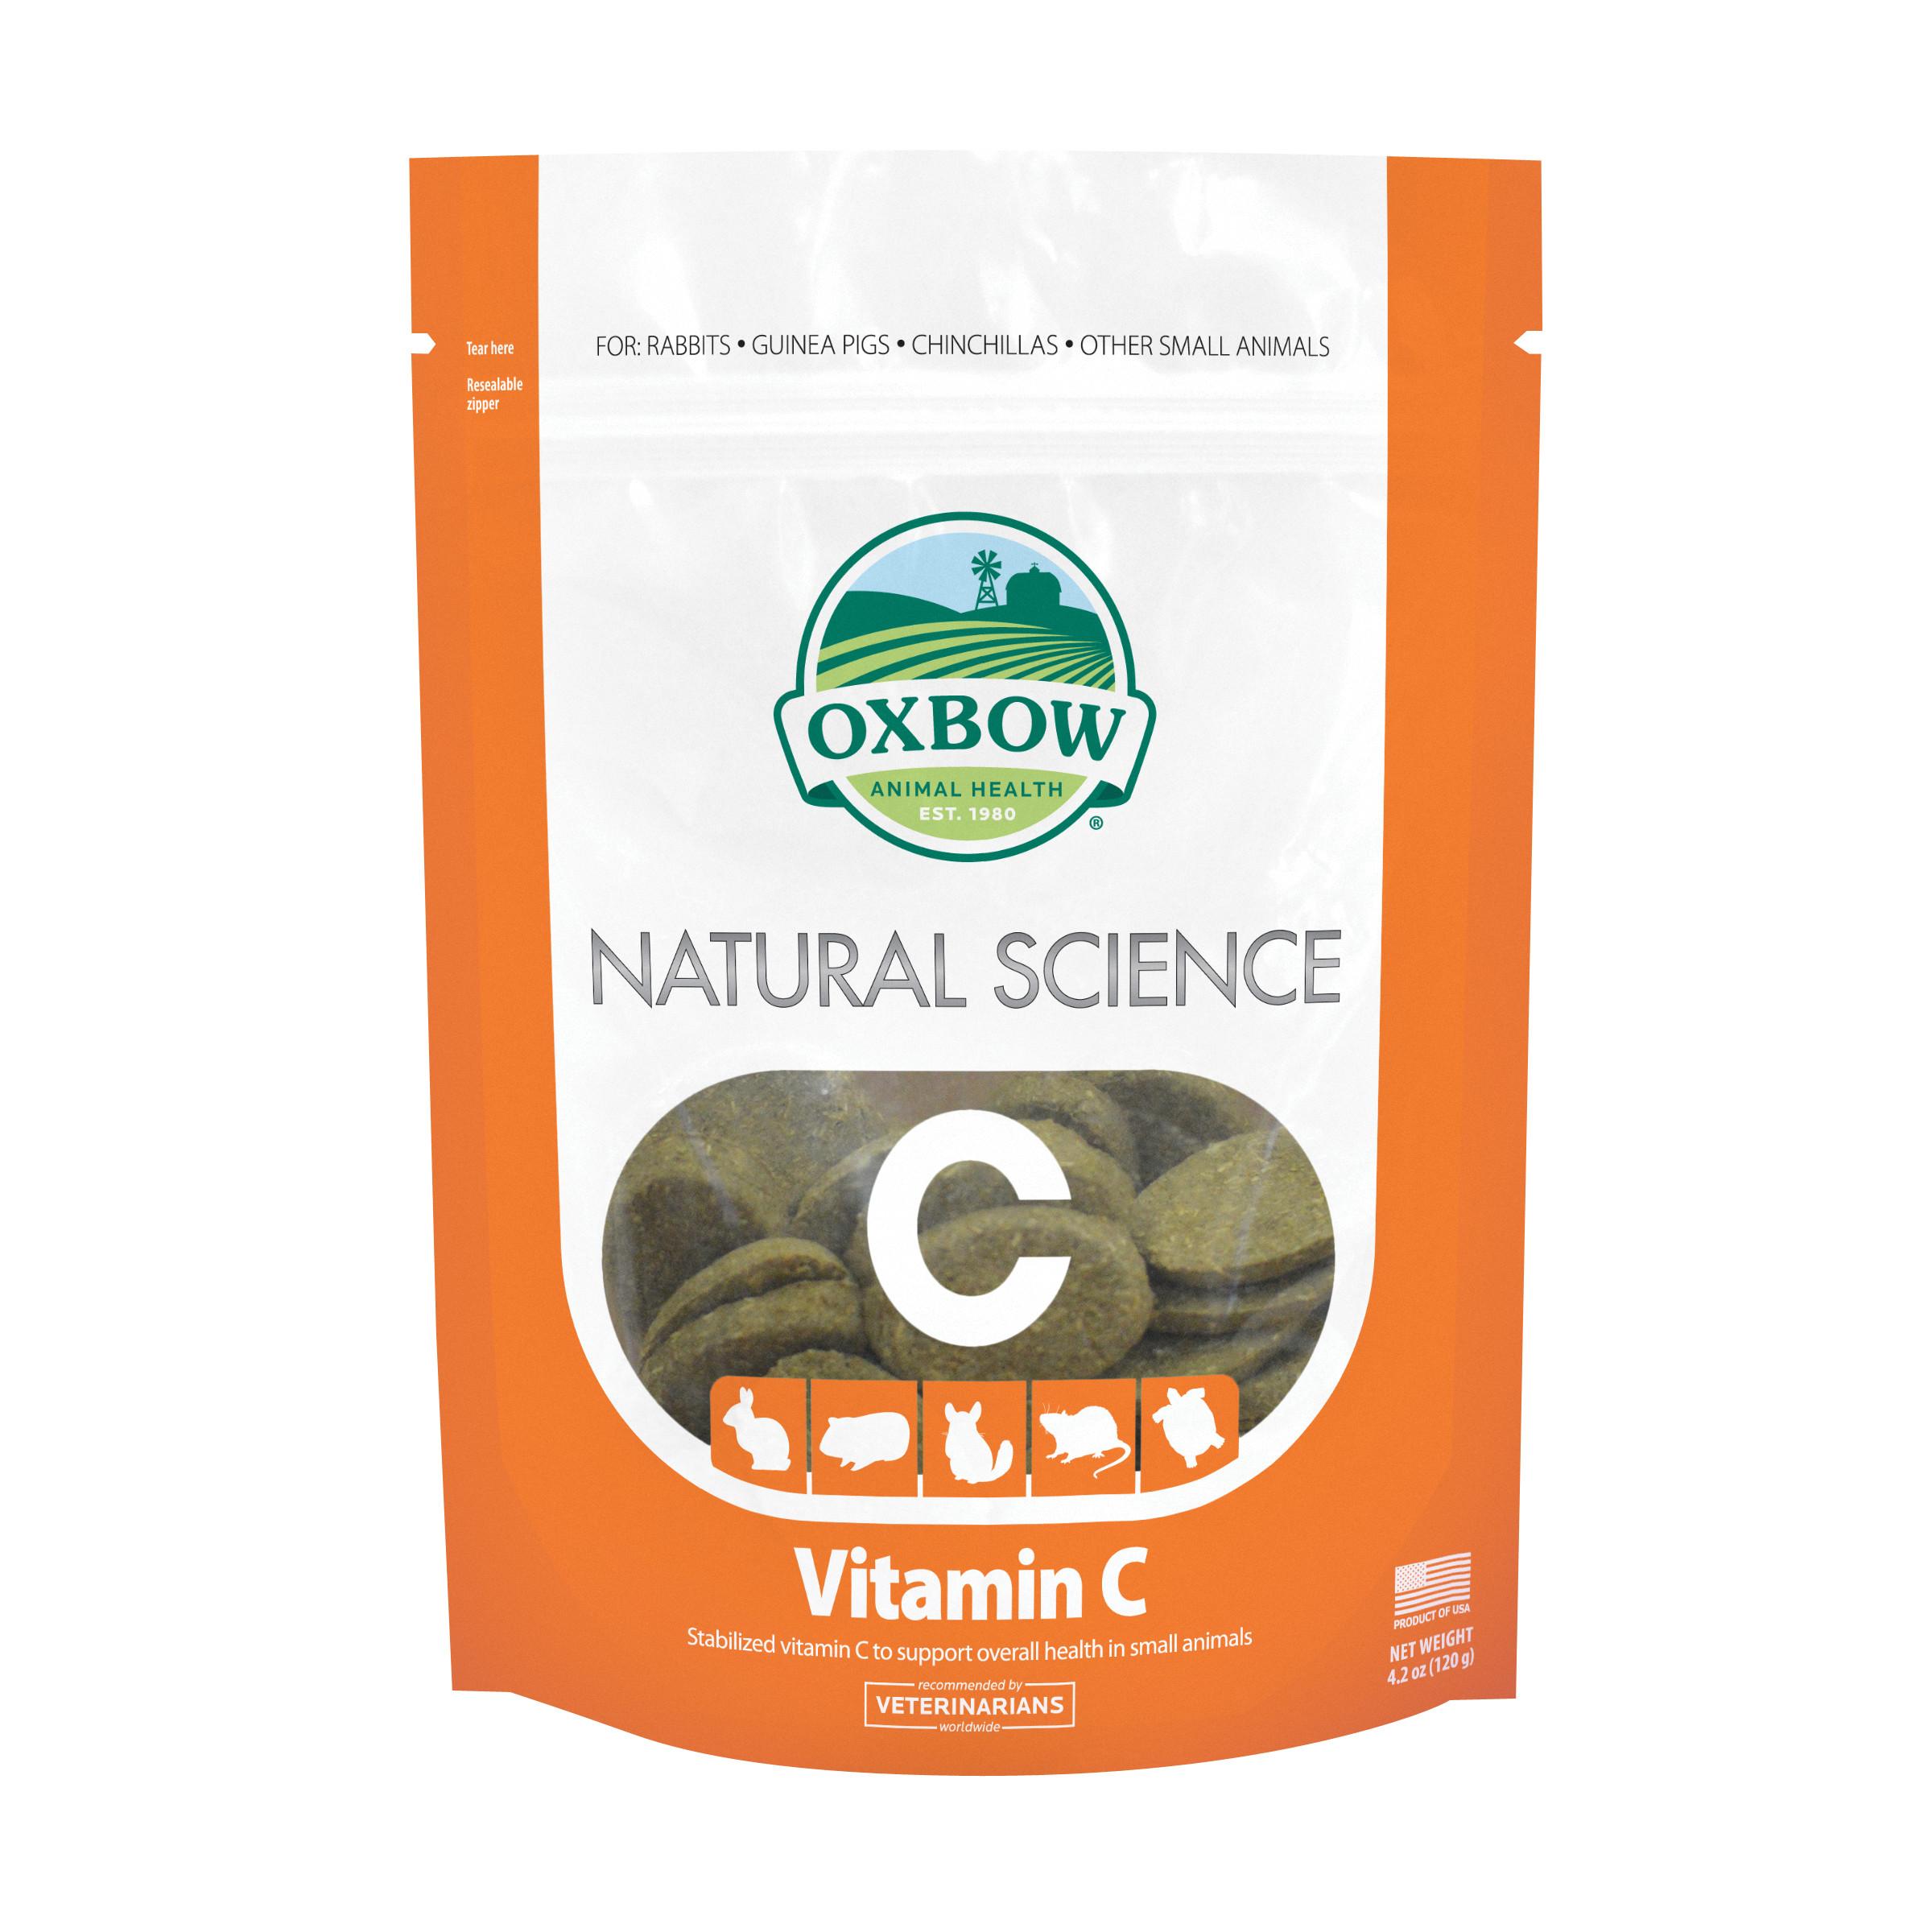 Vitamin C - 119 g